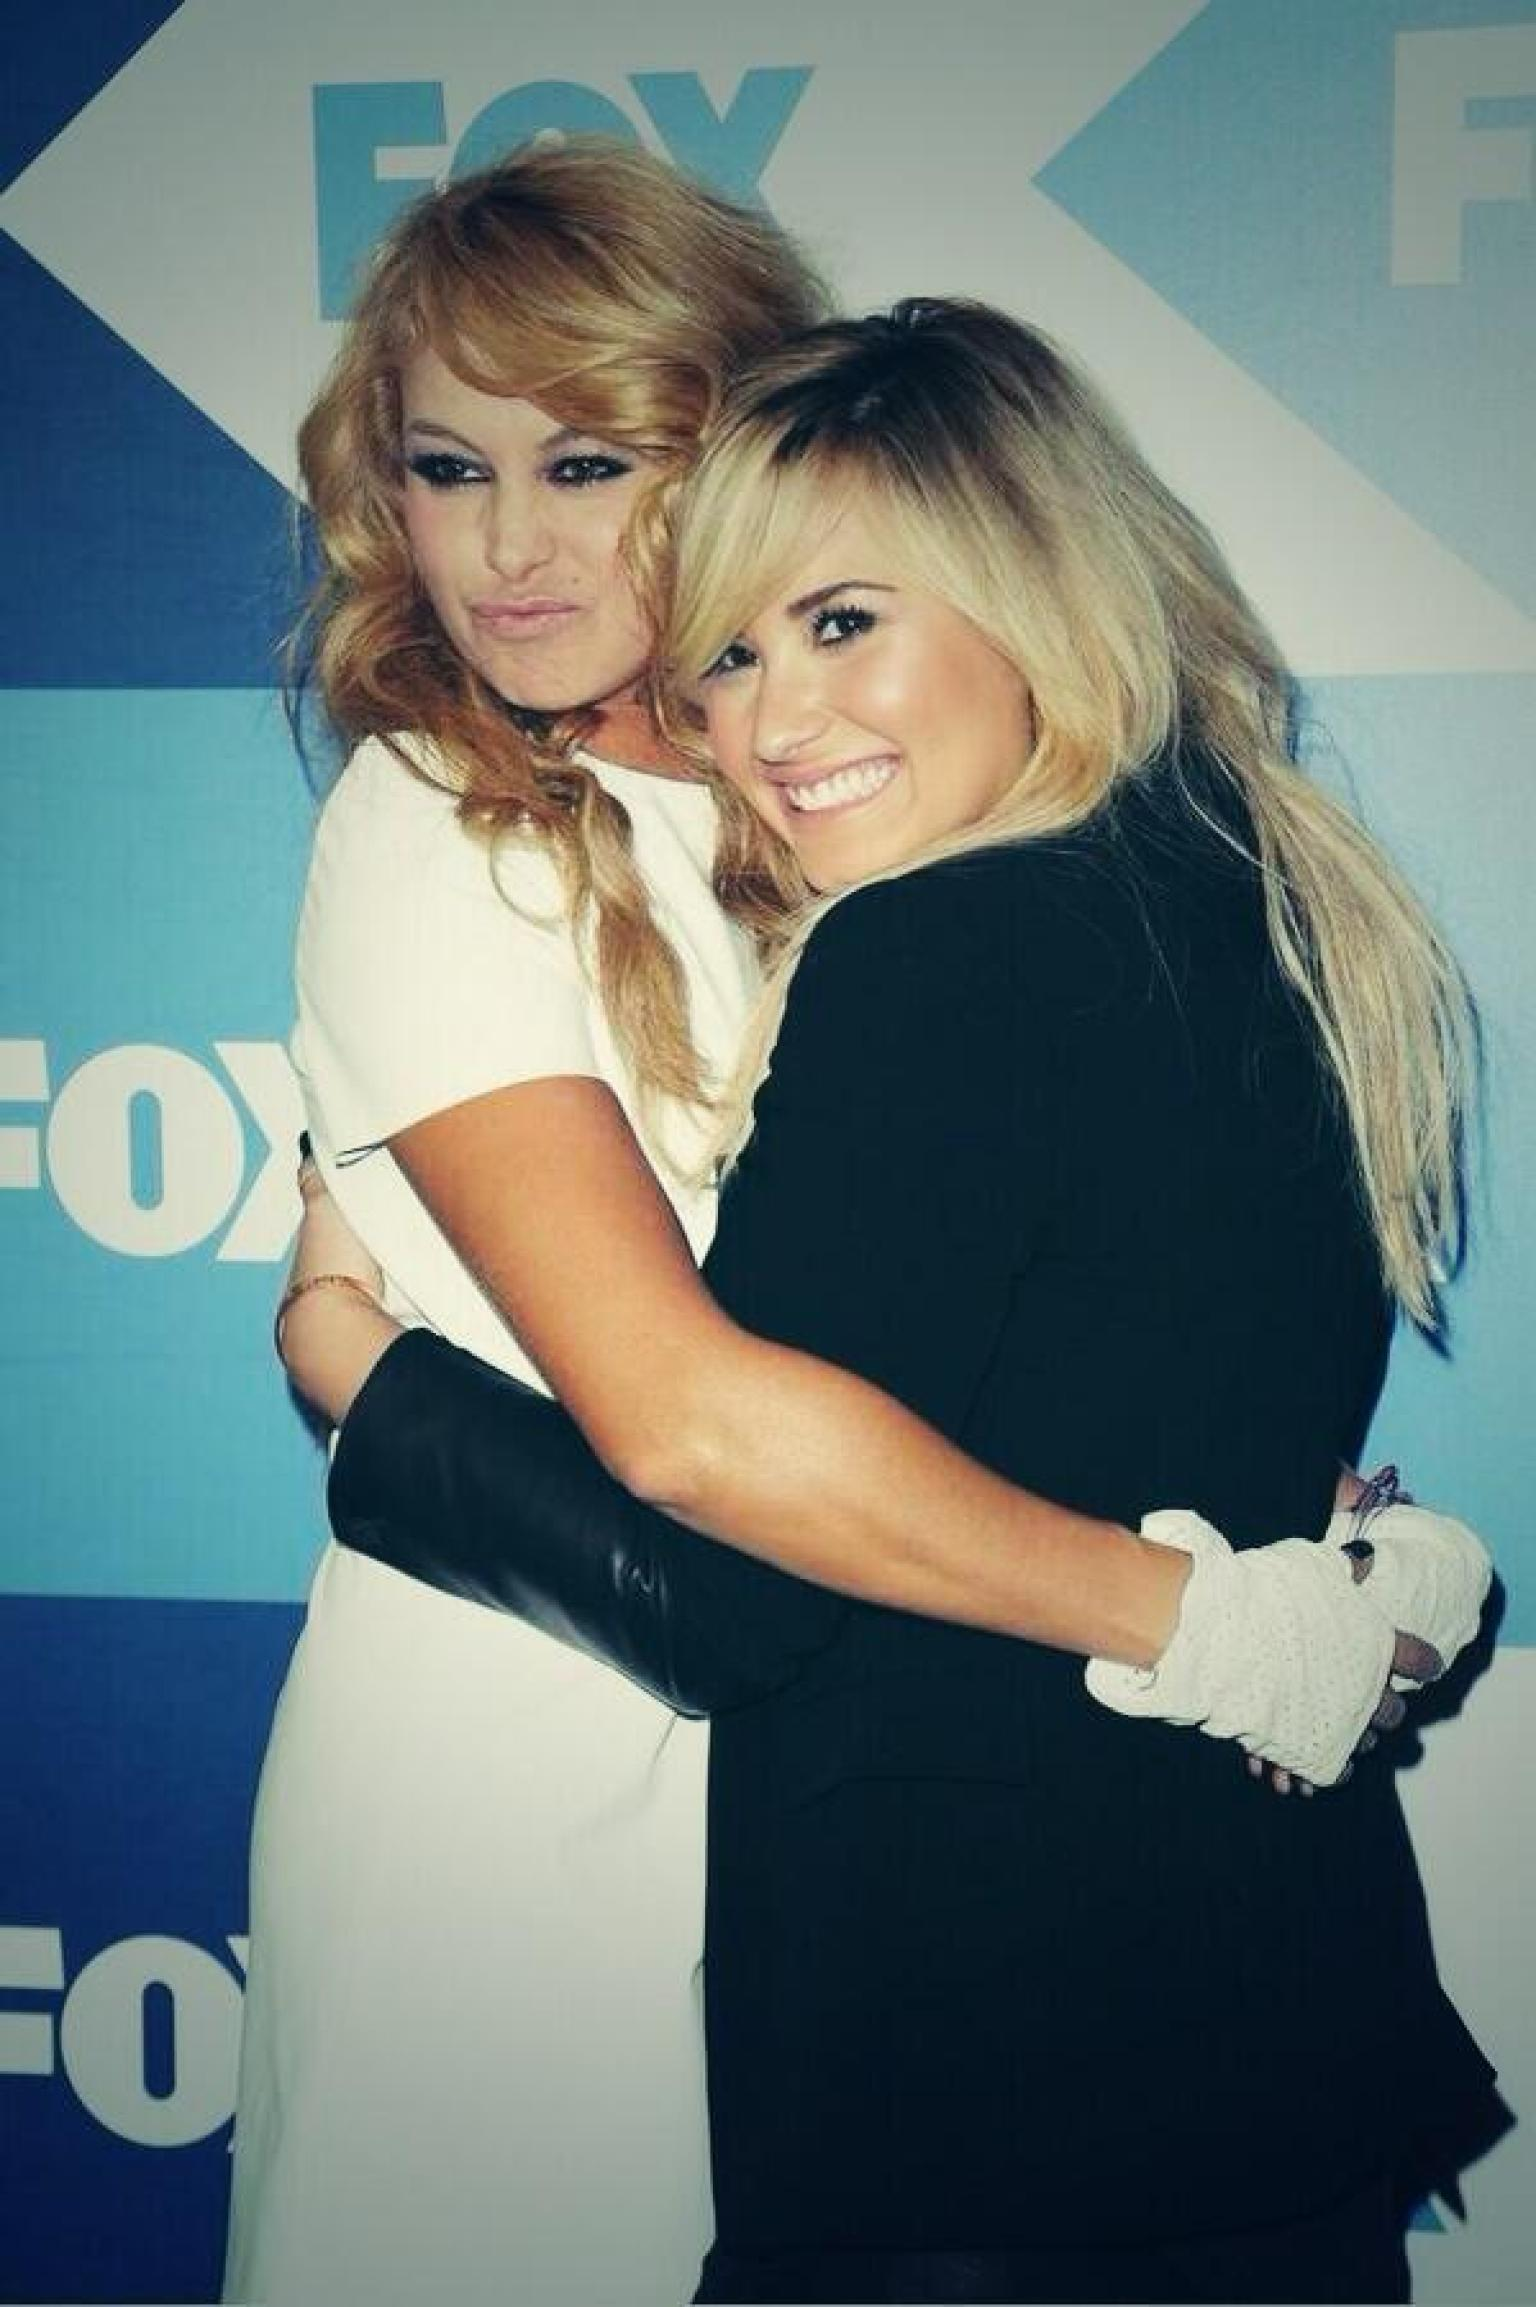 Photo of Paulina Rubio & her friend  Demi Lovato